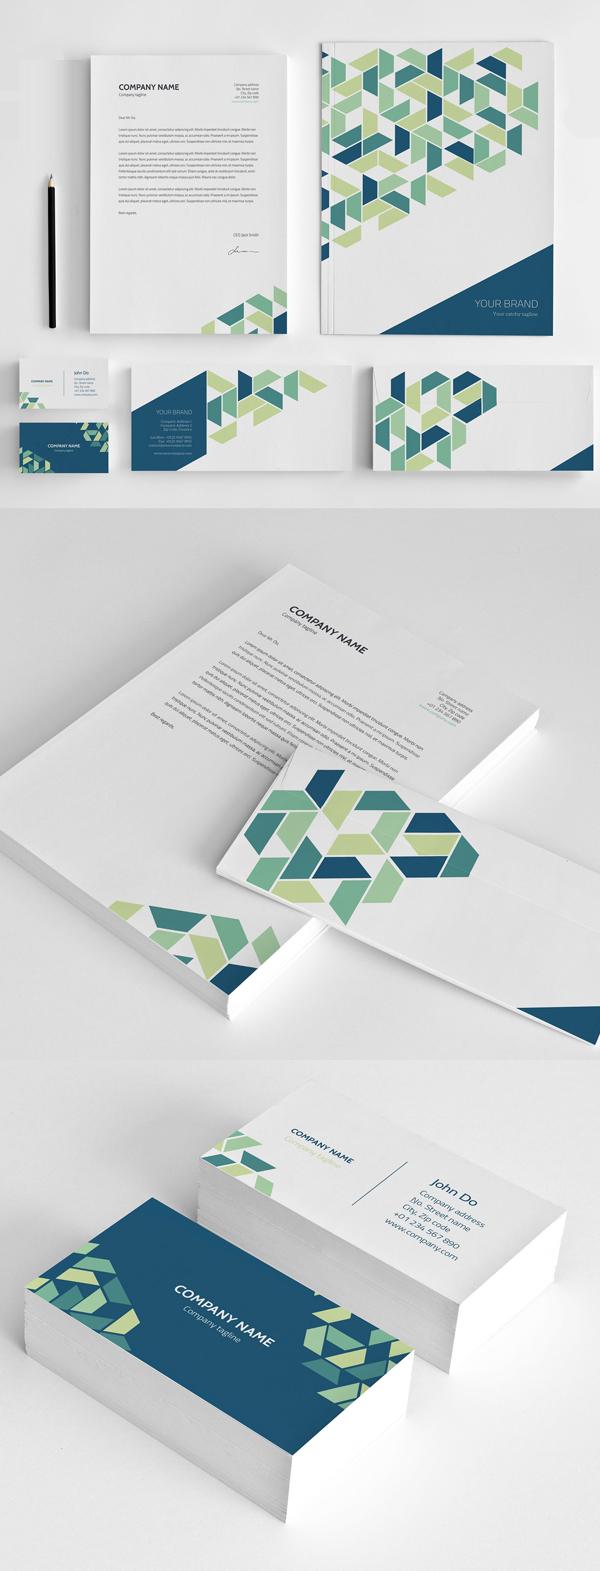 50 Professional Corporate Branding / Stationery Templates Design - 5